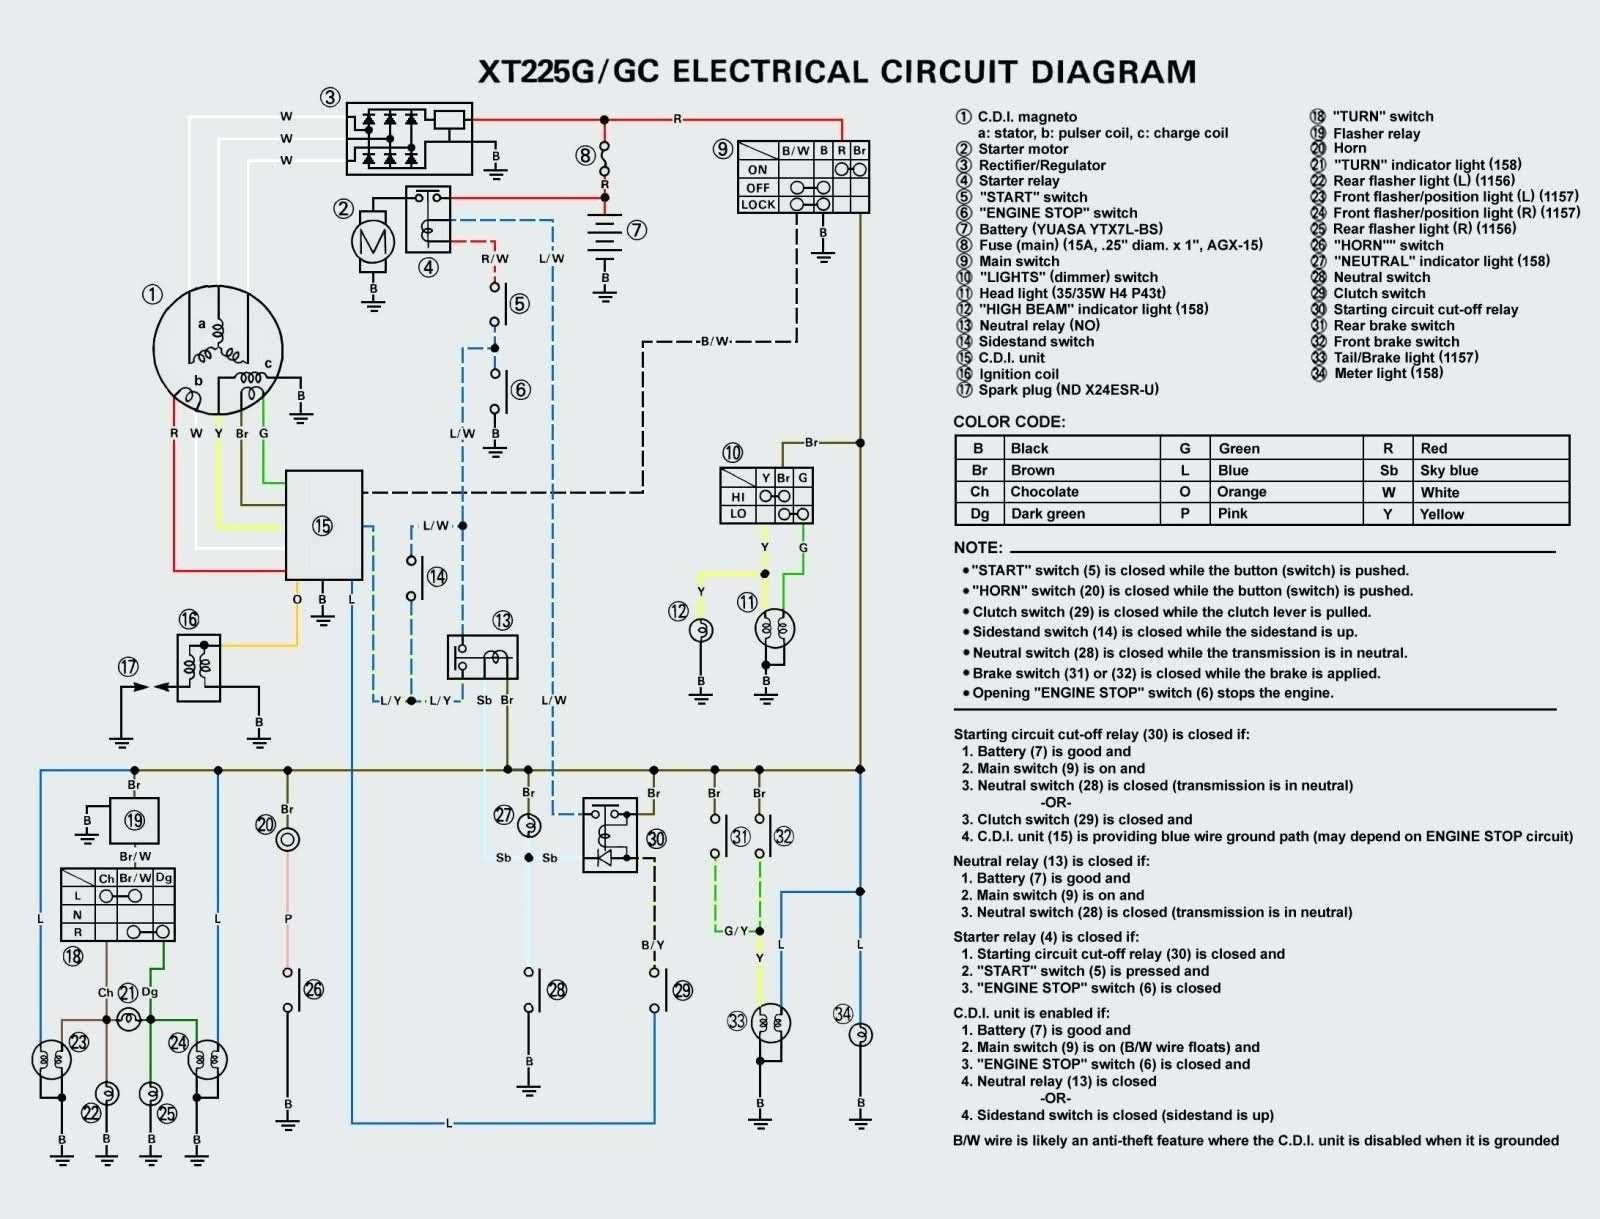 yamaha kodiak 450 wiring diagram abb vfd 400 new image